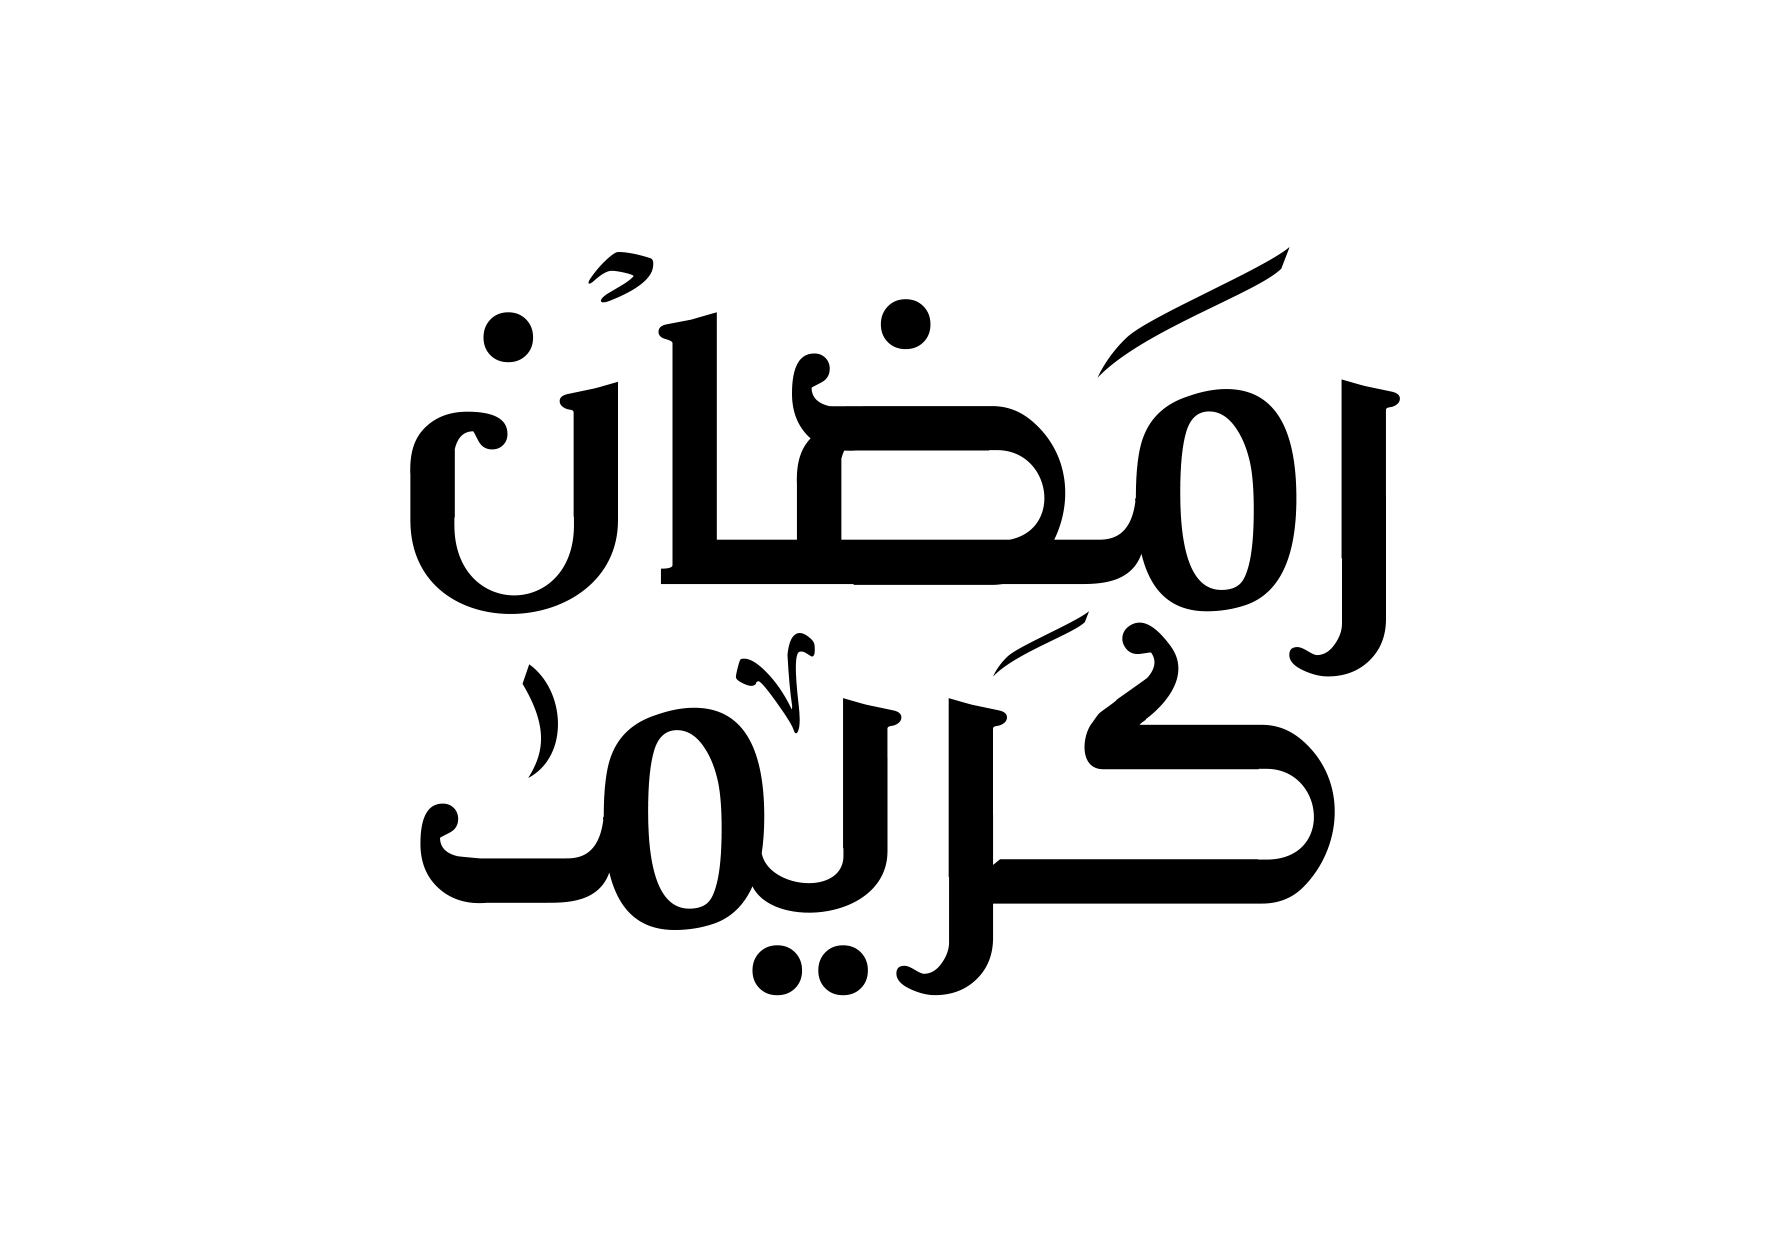 مخطوطه رمضان كريم مفرغه 1 15 مخطوطه لشهر رمضان بالخط الحر png